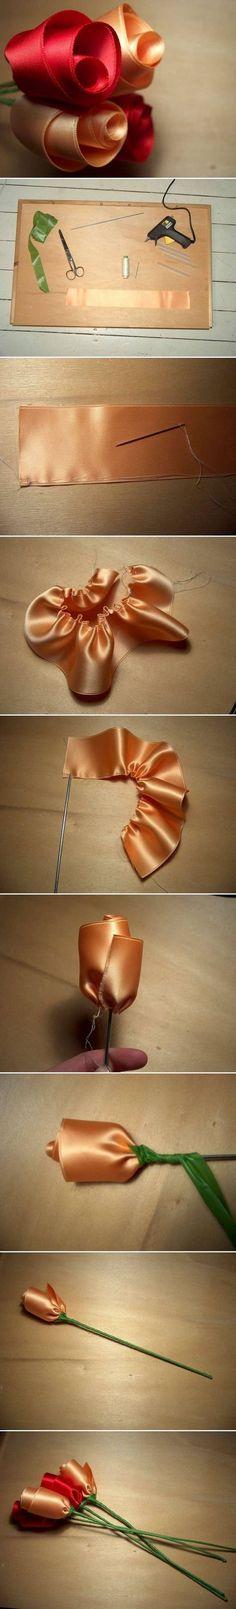 DIY Quick Satin Ribbon Roses DIY Projects / UsefulDIY.com